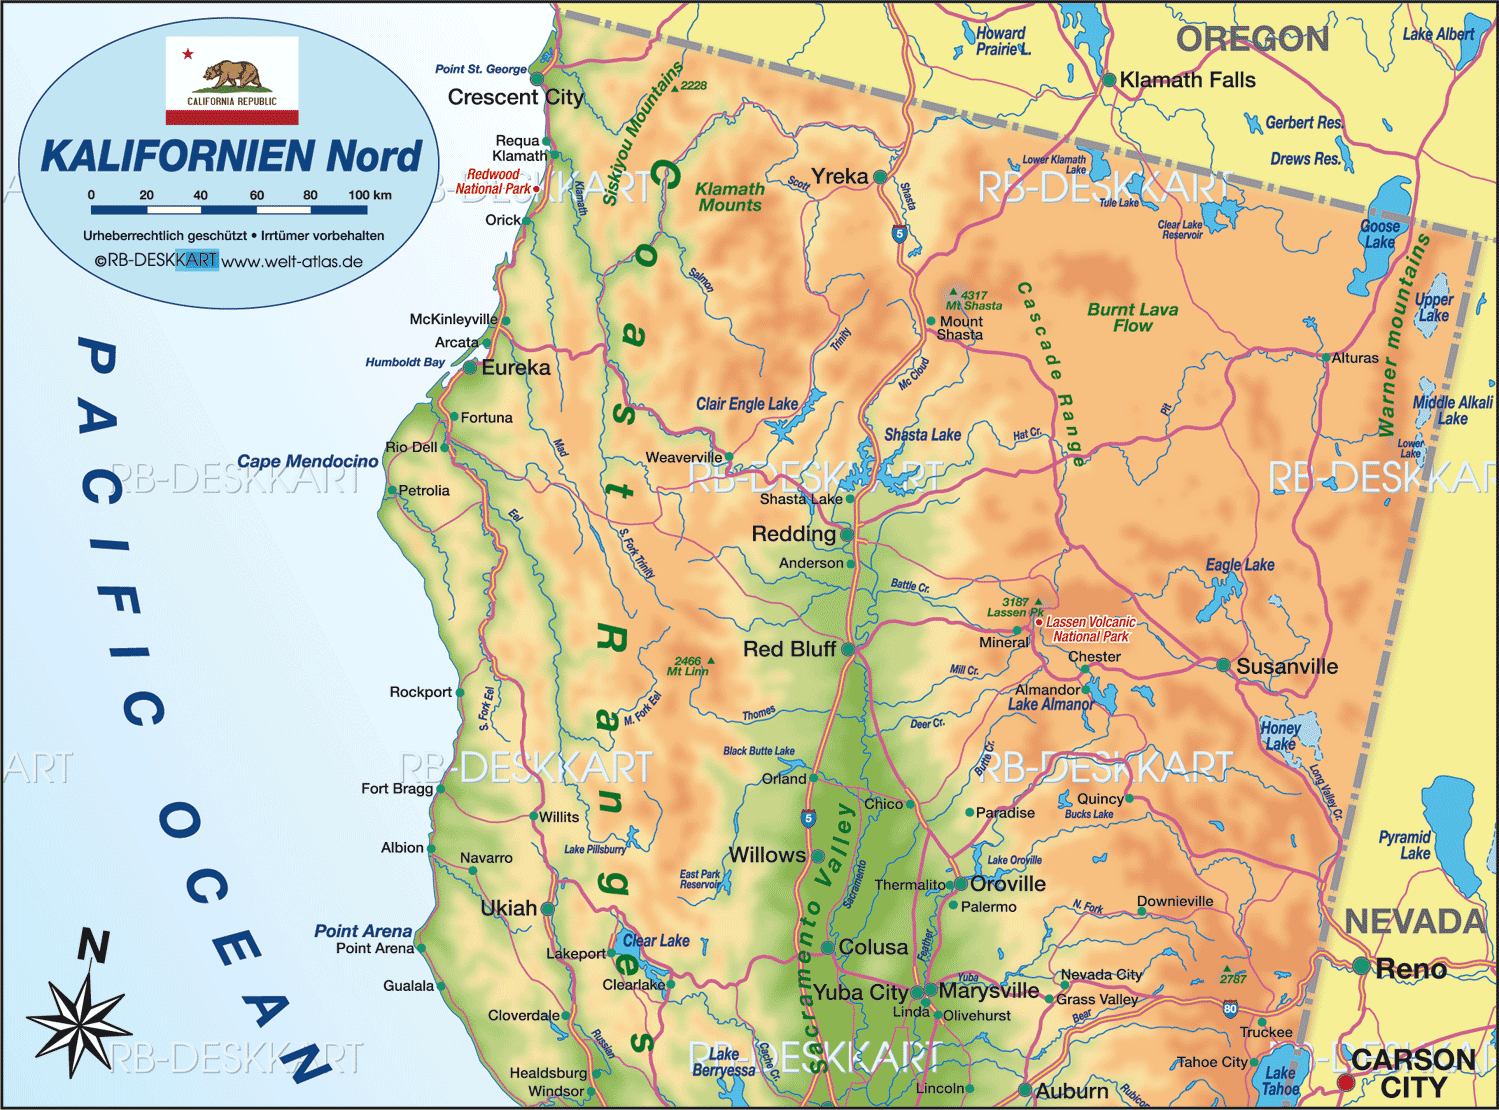 Karte Printable Map Of Mount Shasta California Map - Klipy - Mount Shasta California Map